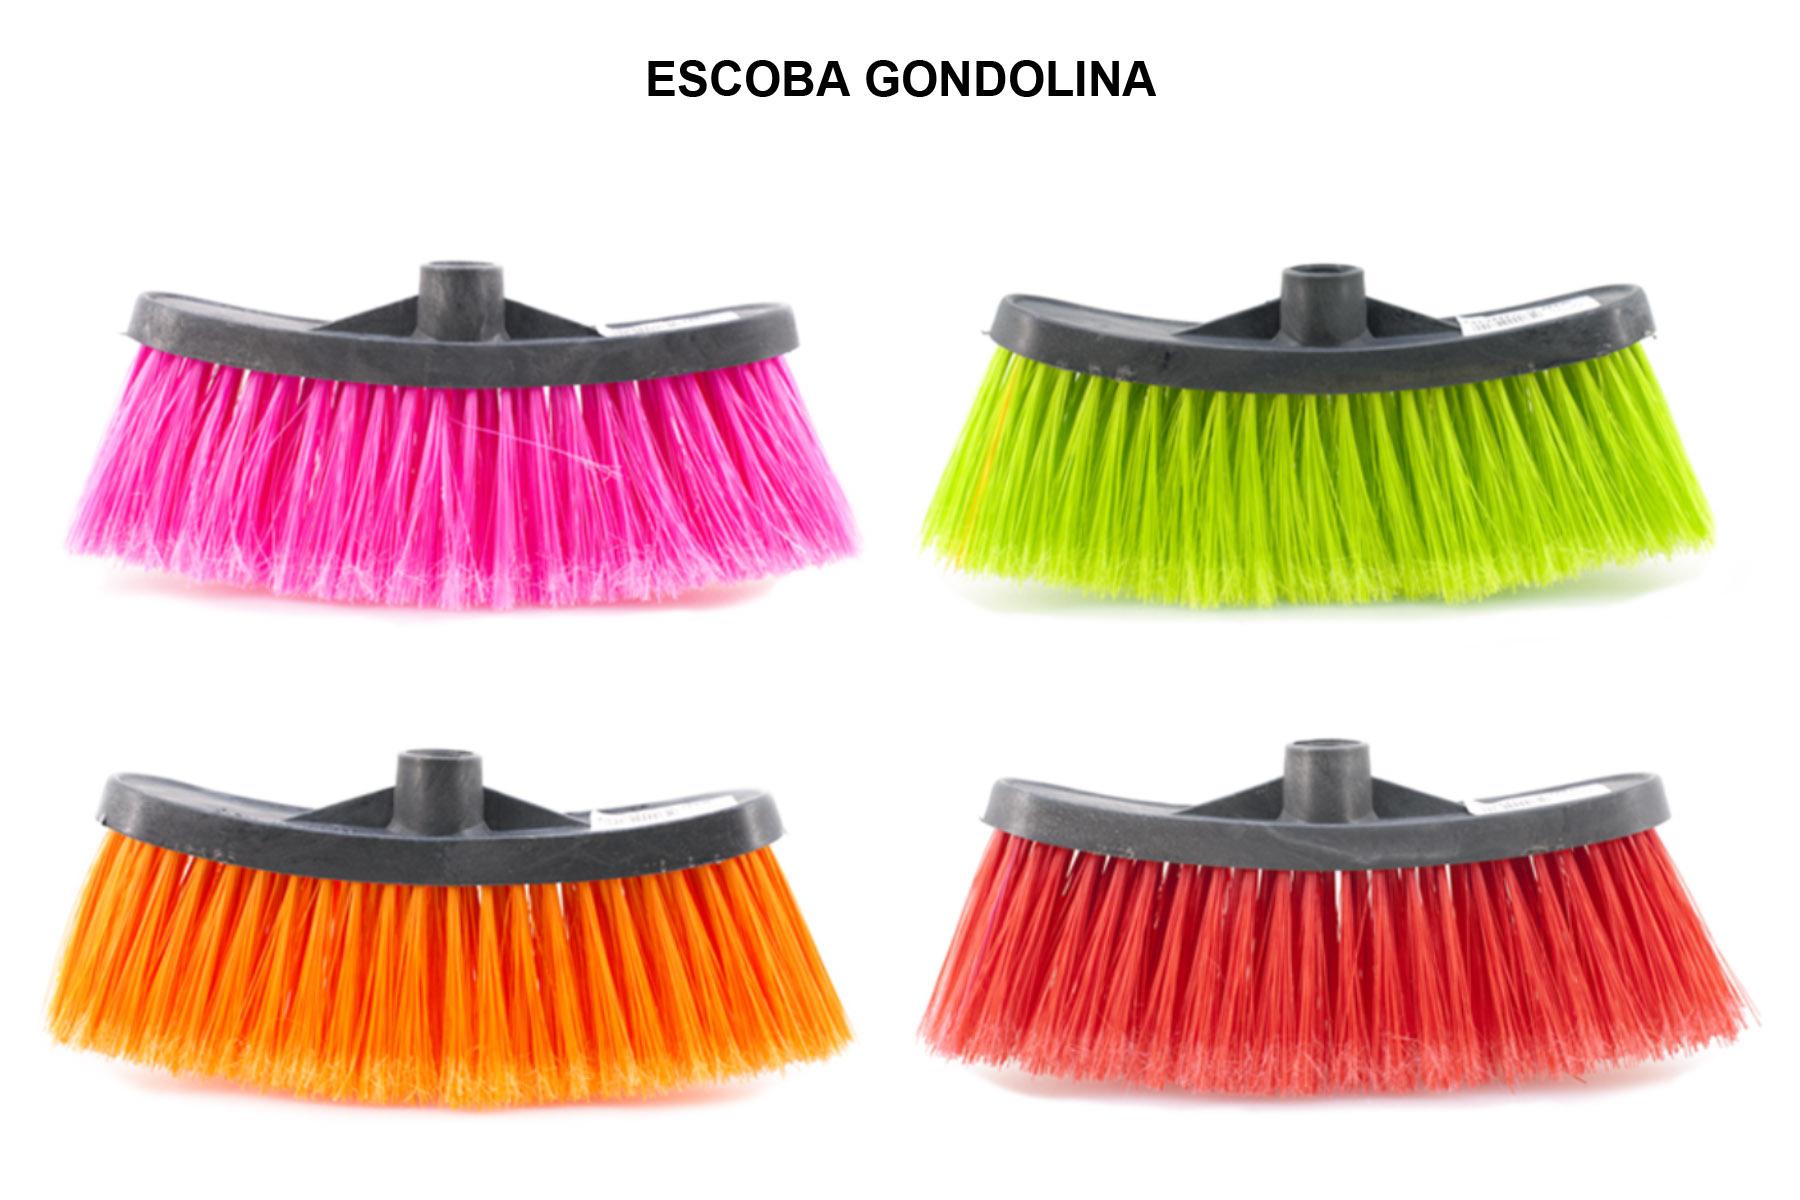 ESCOBA GONDOLINA